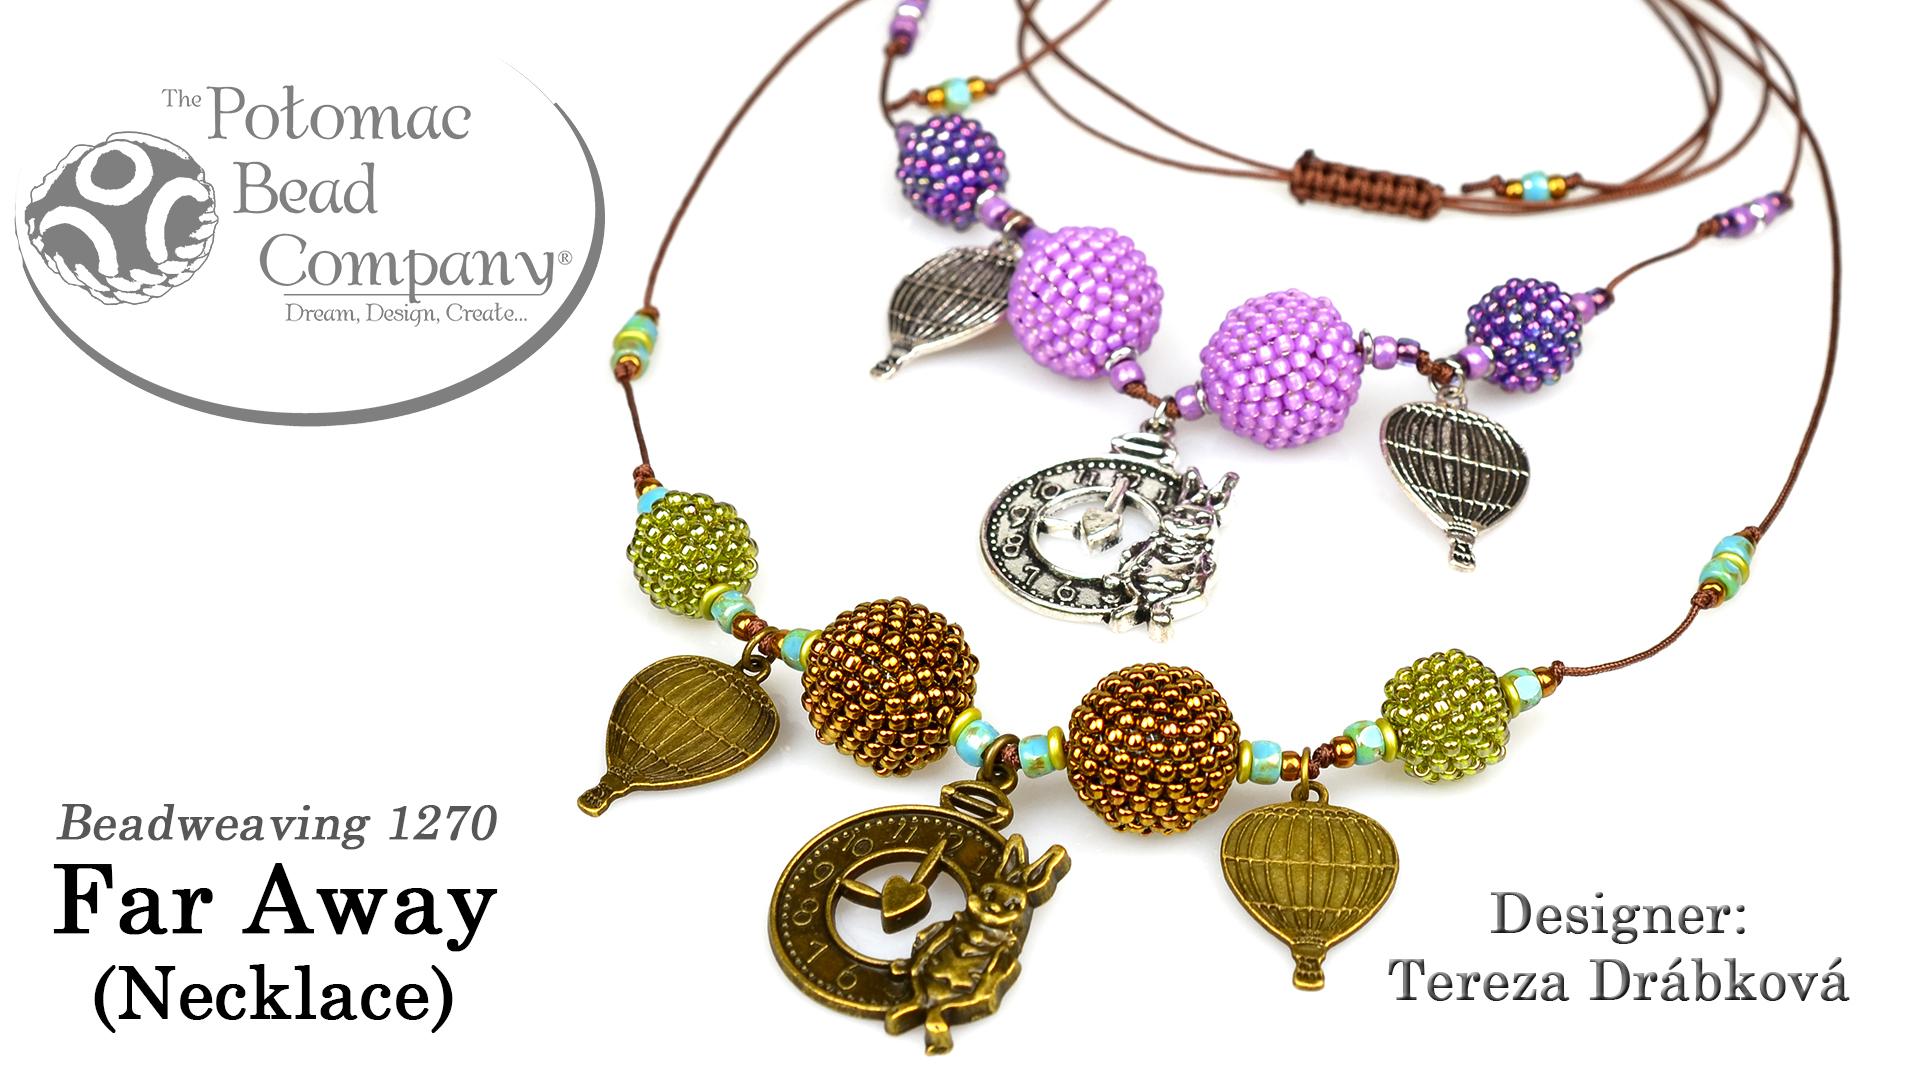 How to Bead Jewelry / Beading Tutorials & Jewel Making Videos / Bead Weaving Tutorials & Necklace Tutorial / Far Away Necklace Tutorial